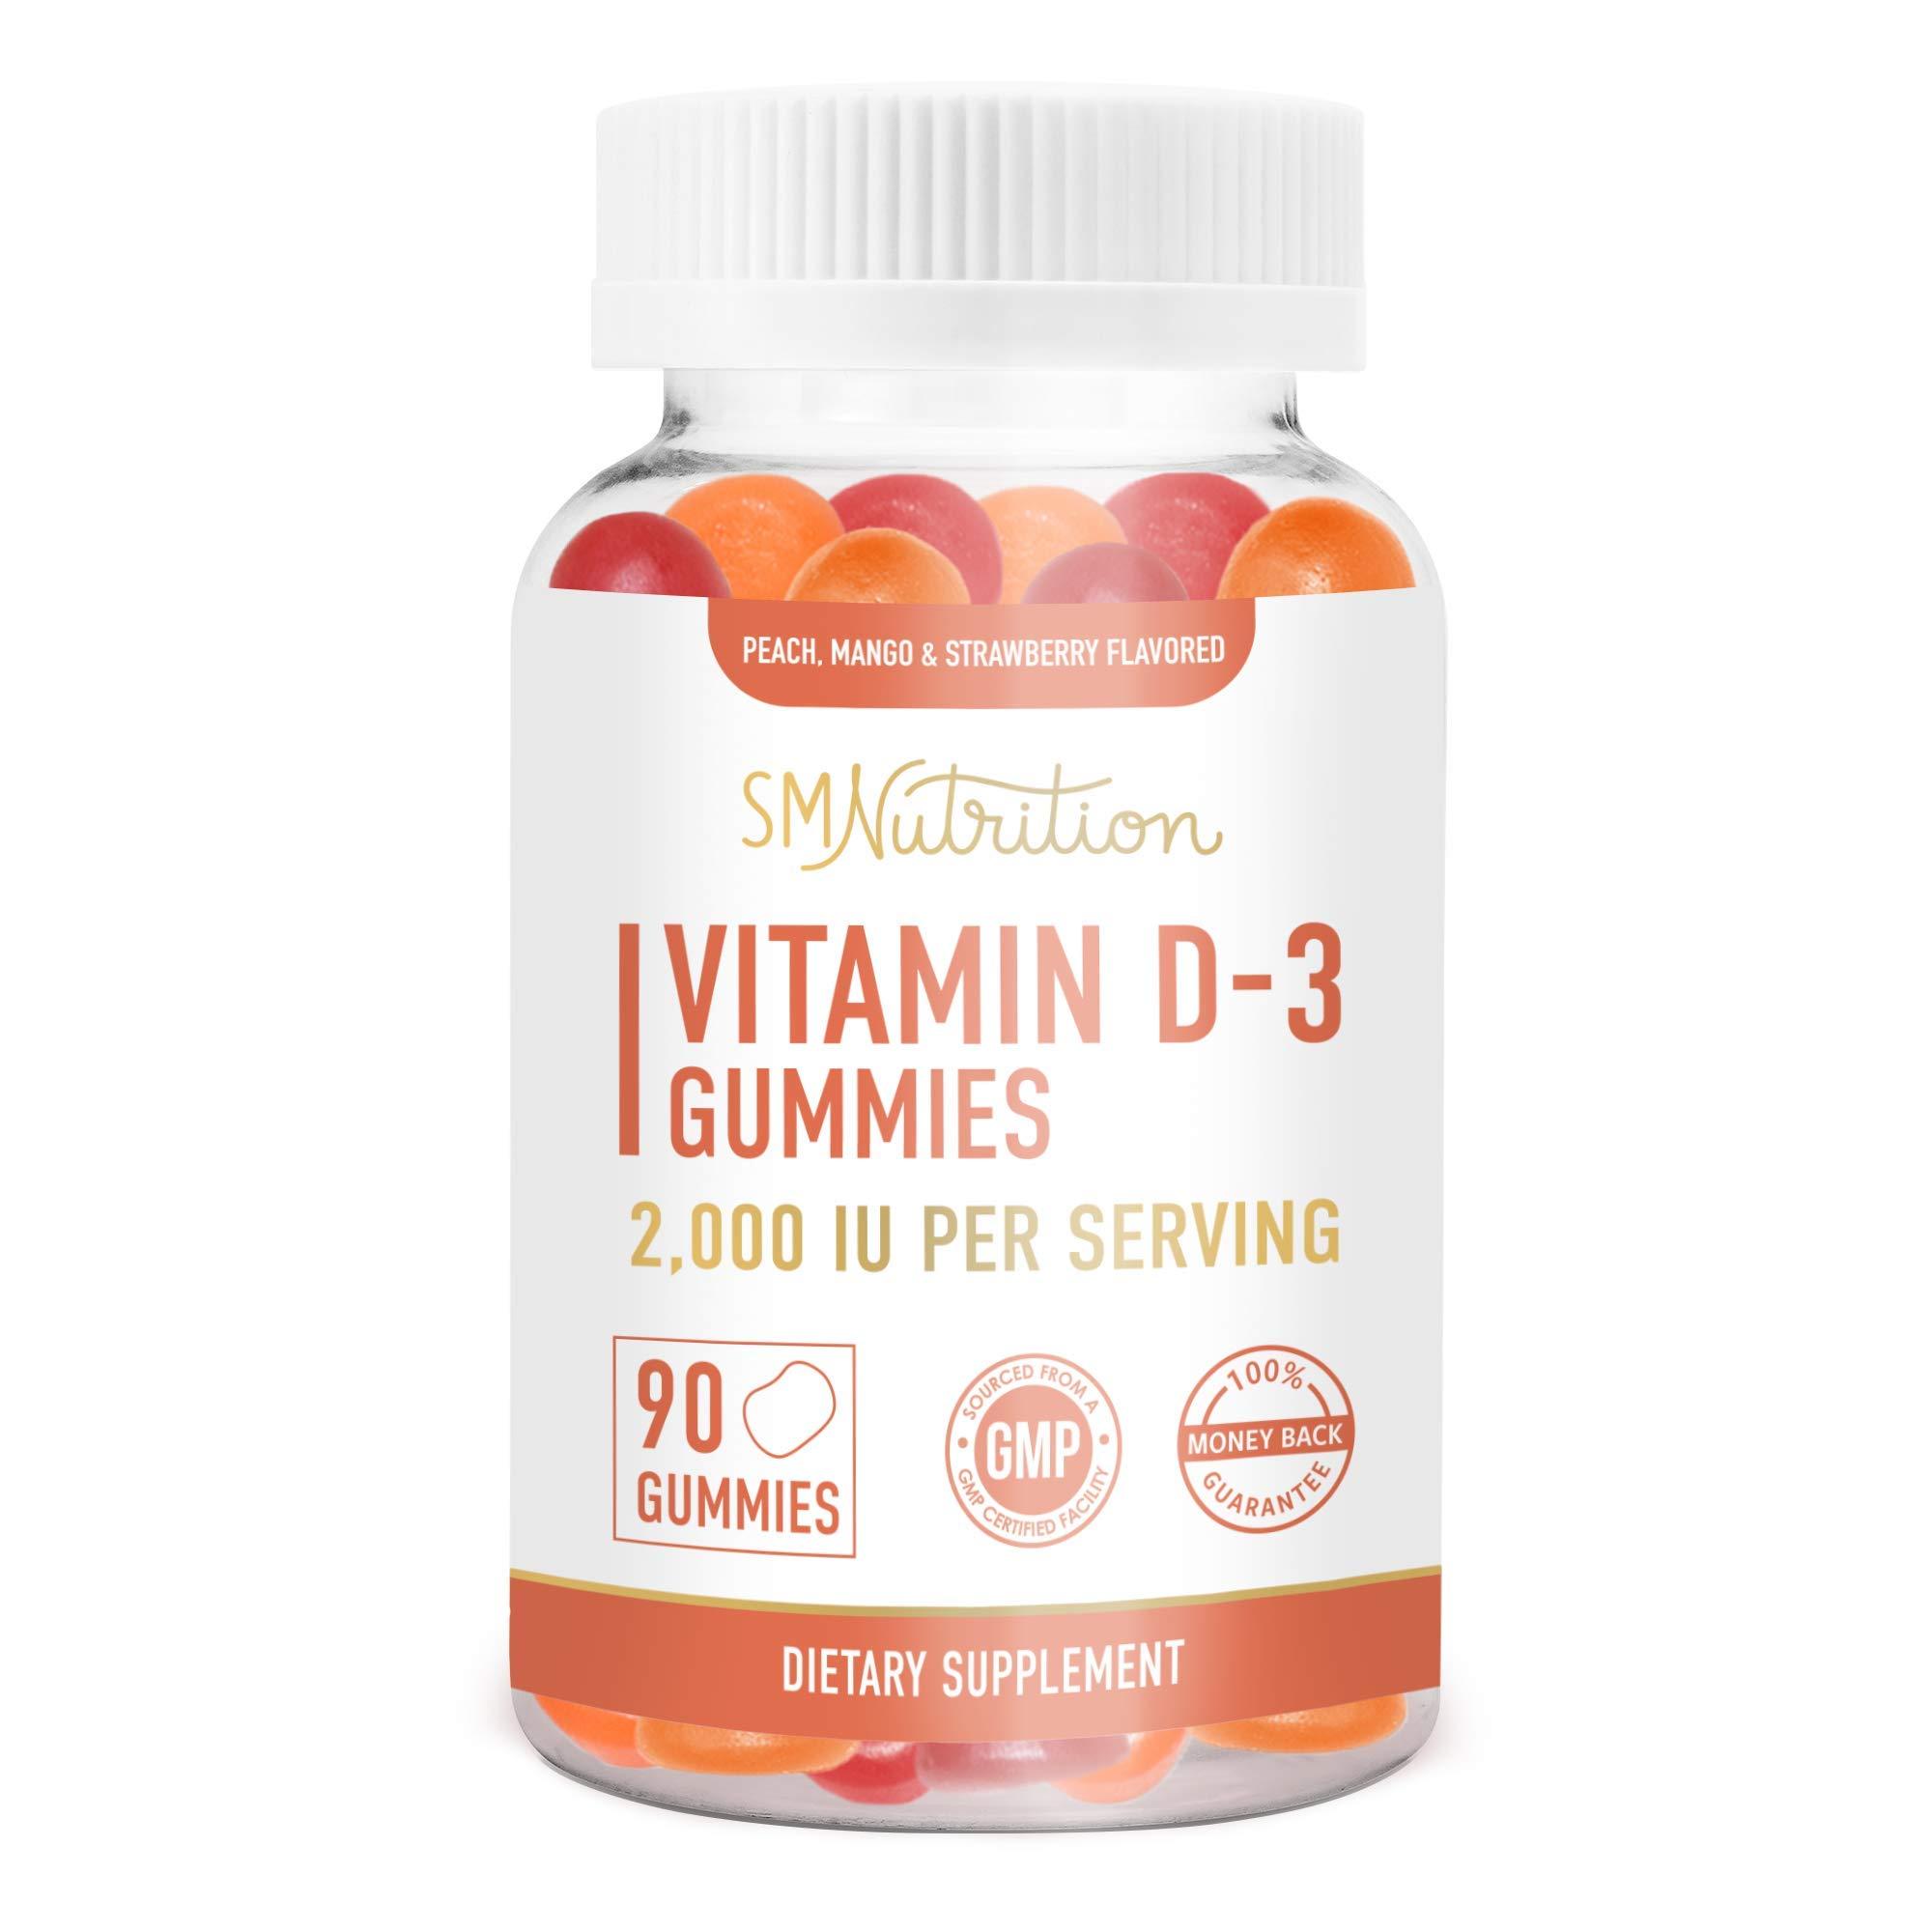 Vitamin D3 Gummies for Adults (90 Count) - 50mcg (2000 IU) - Bone Health*, Immunity*, & Mood Support* Gummies; Third-Party Tested.